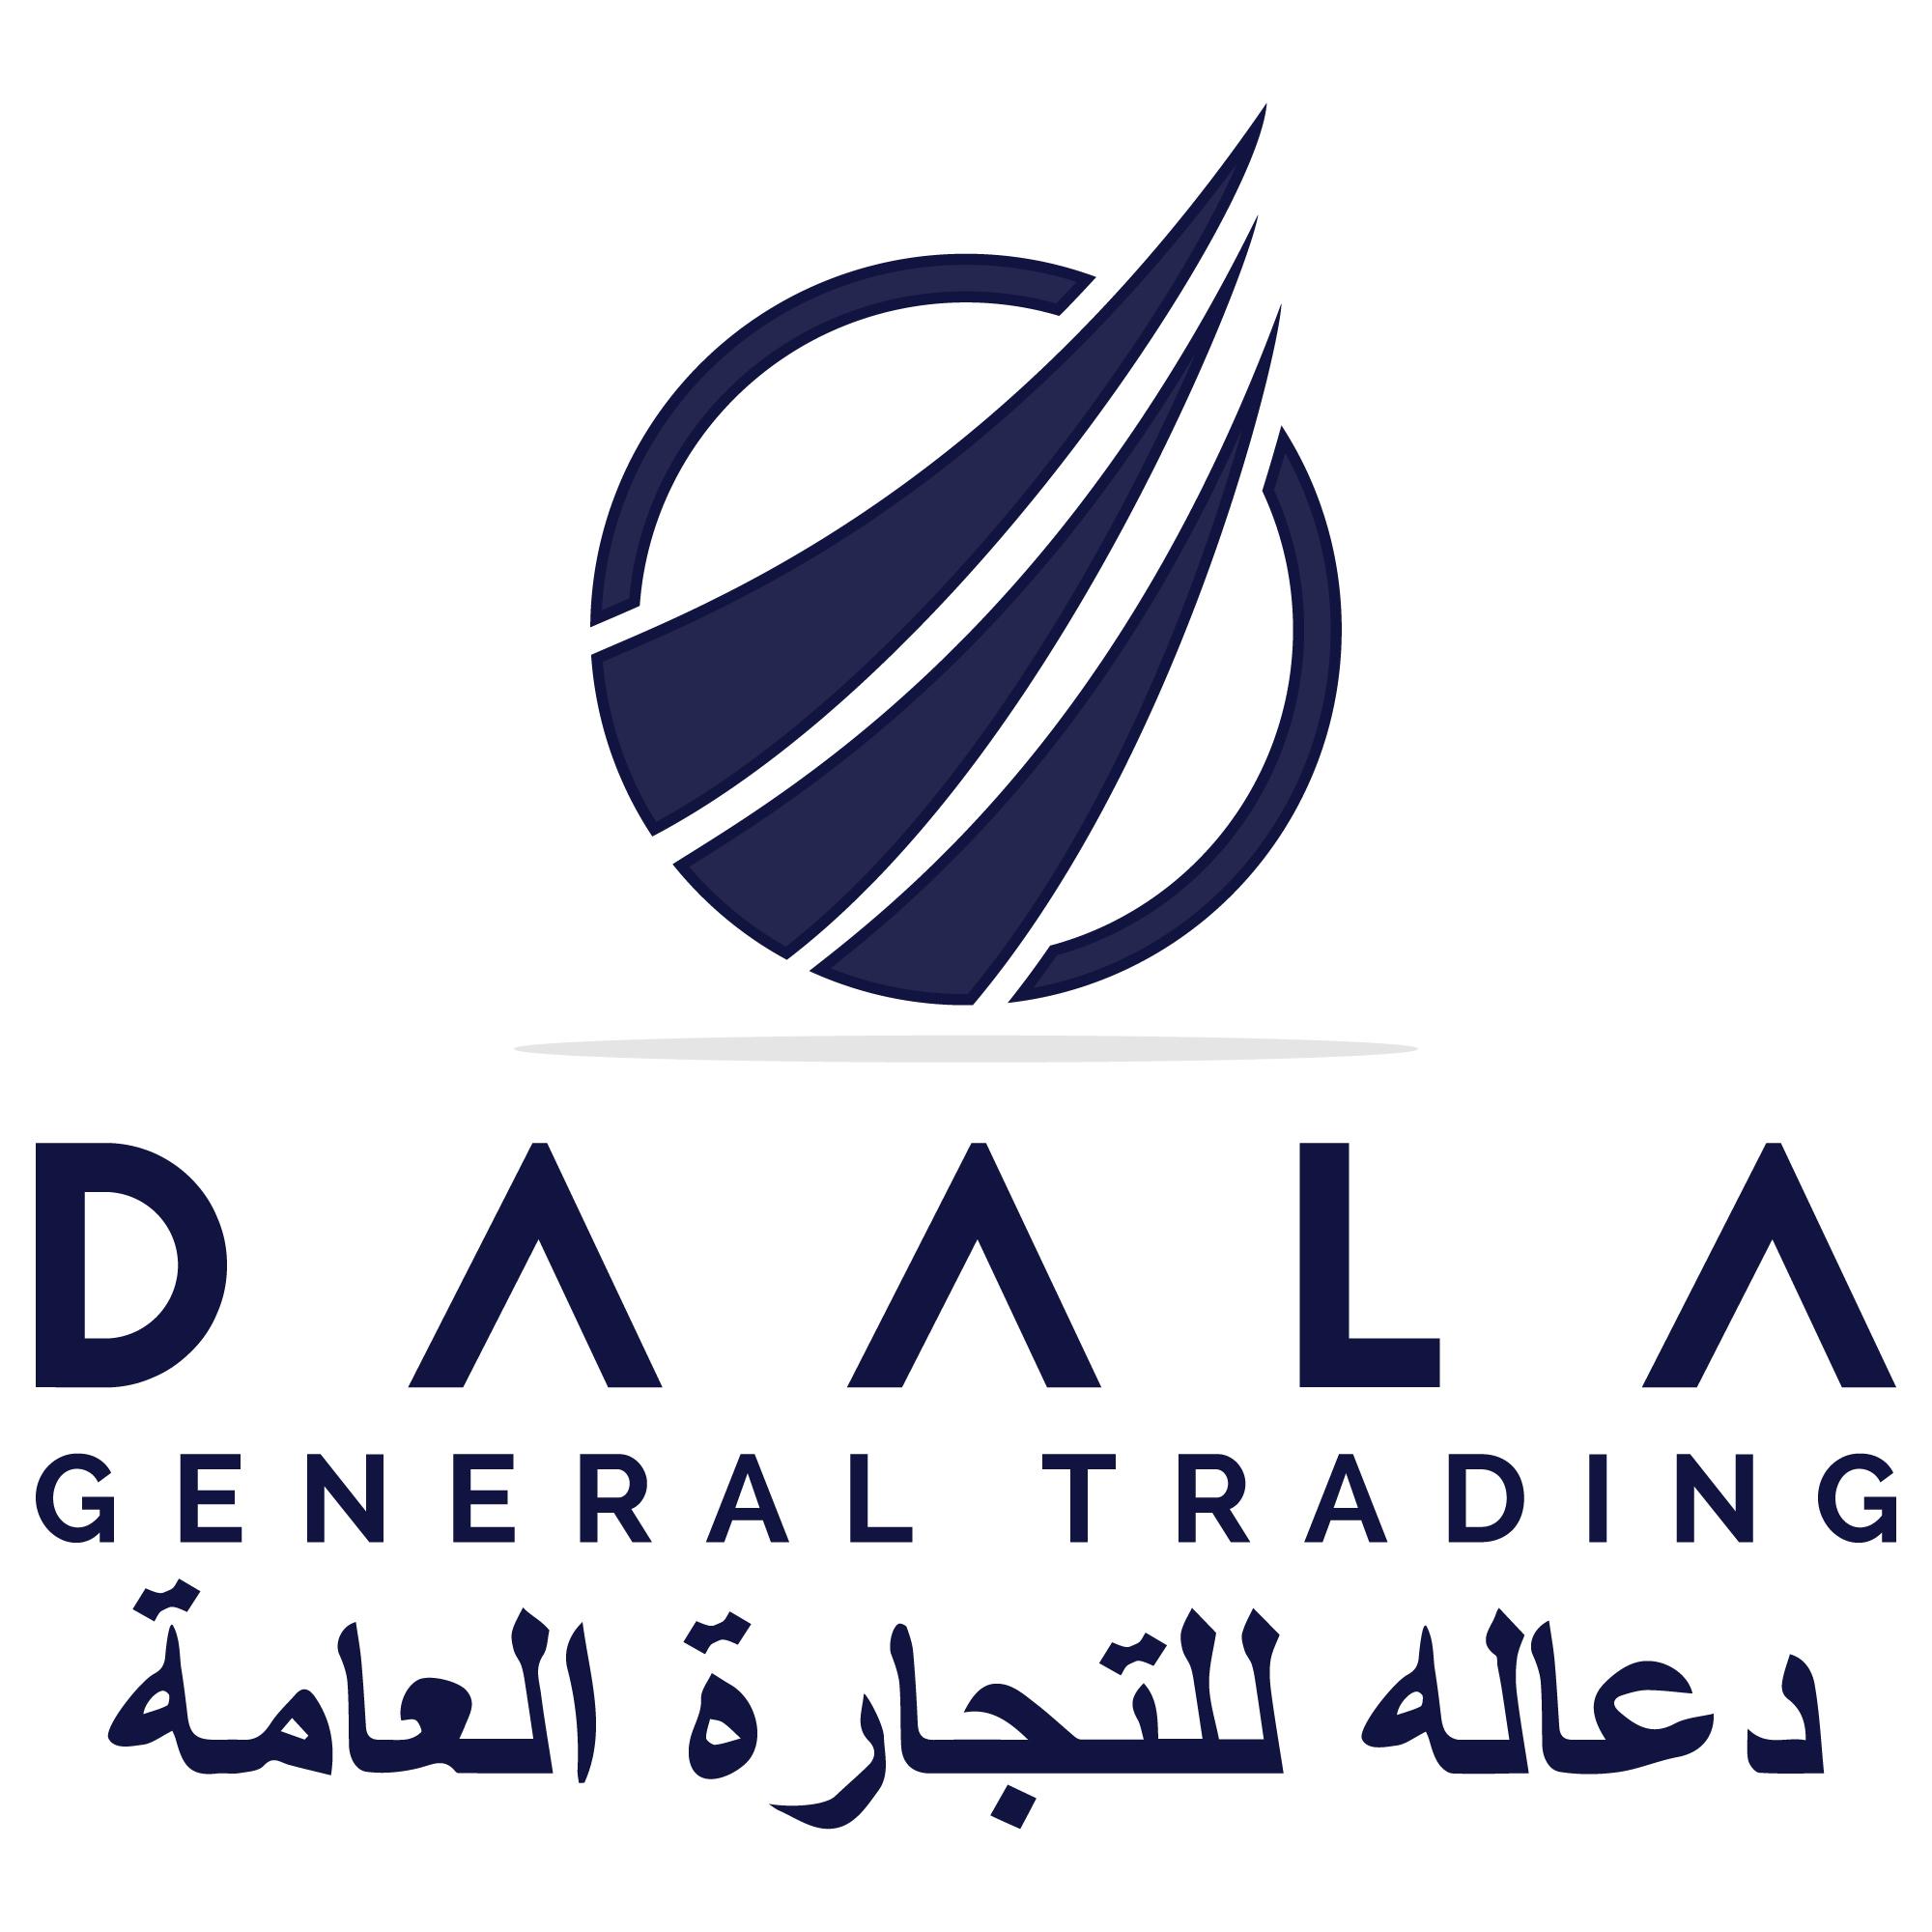 Daala General Trading LLC